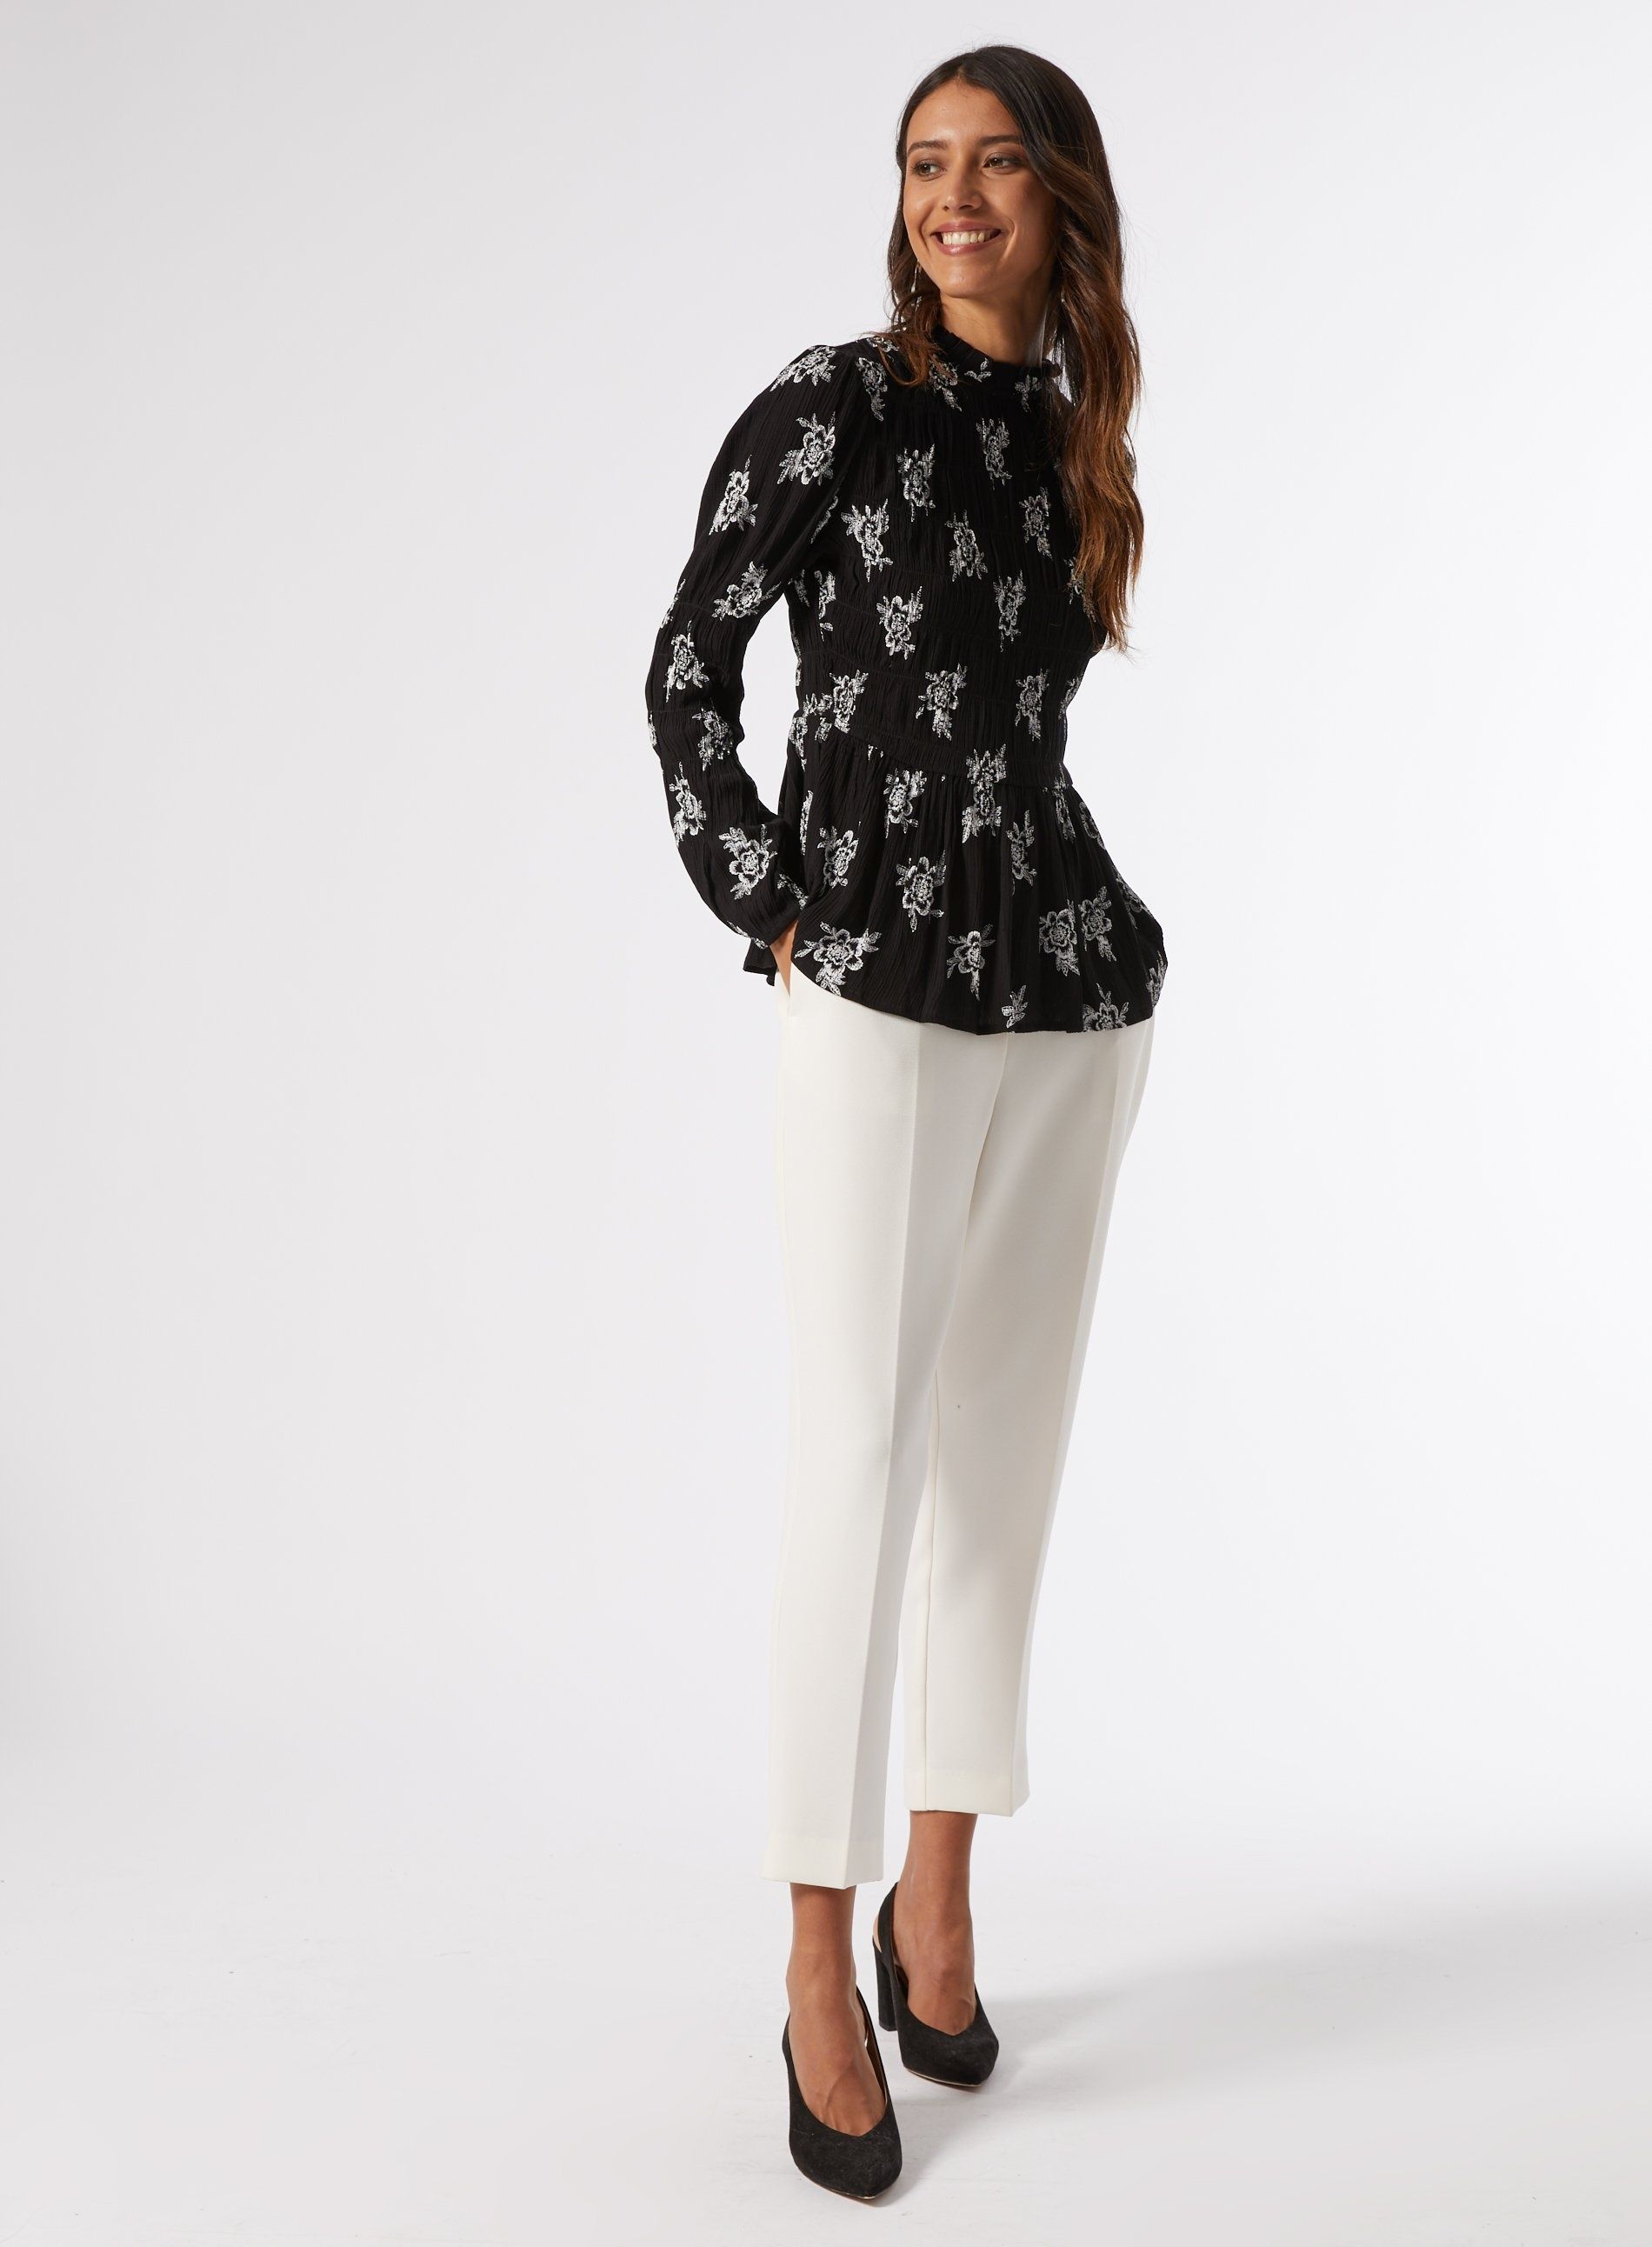 Dorothy Perkins Womens Black Floral Print Shirred Top Shirt Blouse High Neck